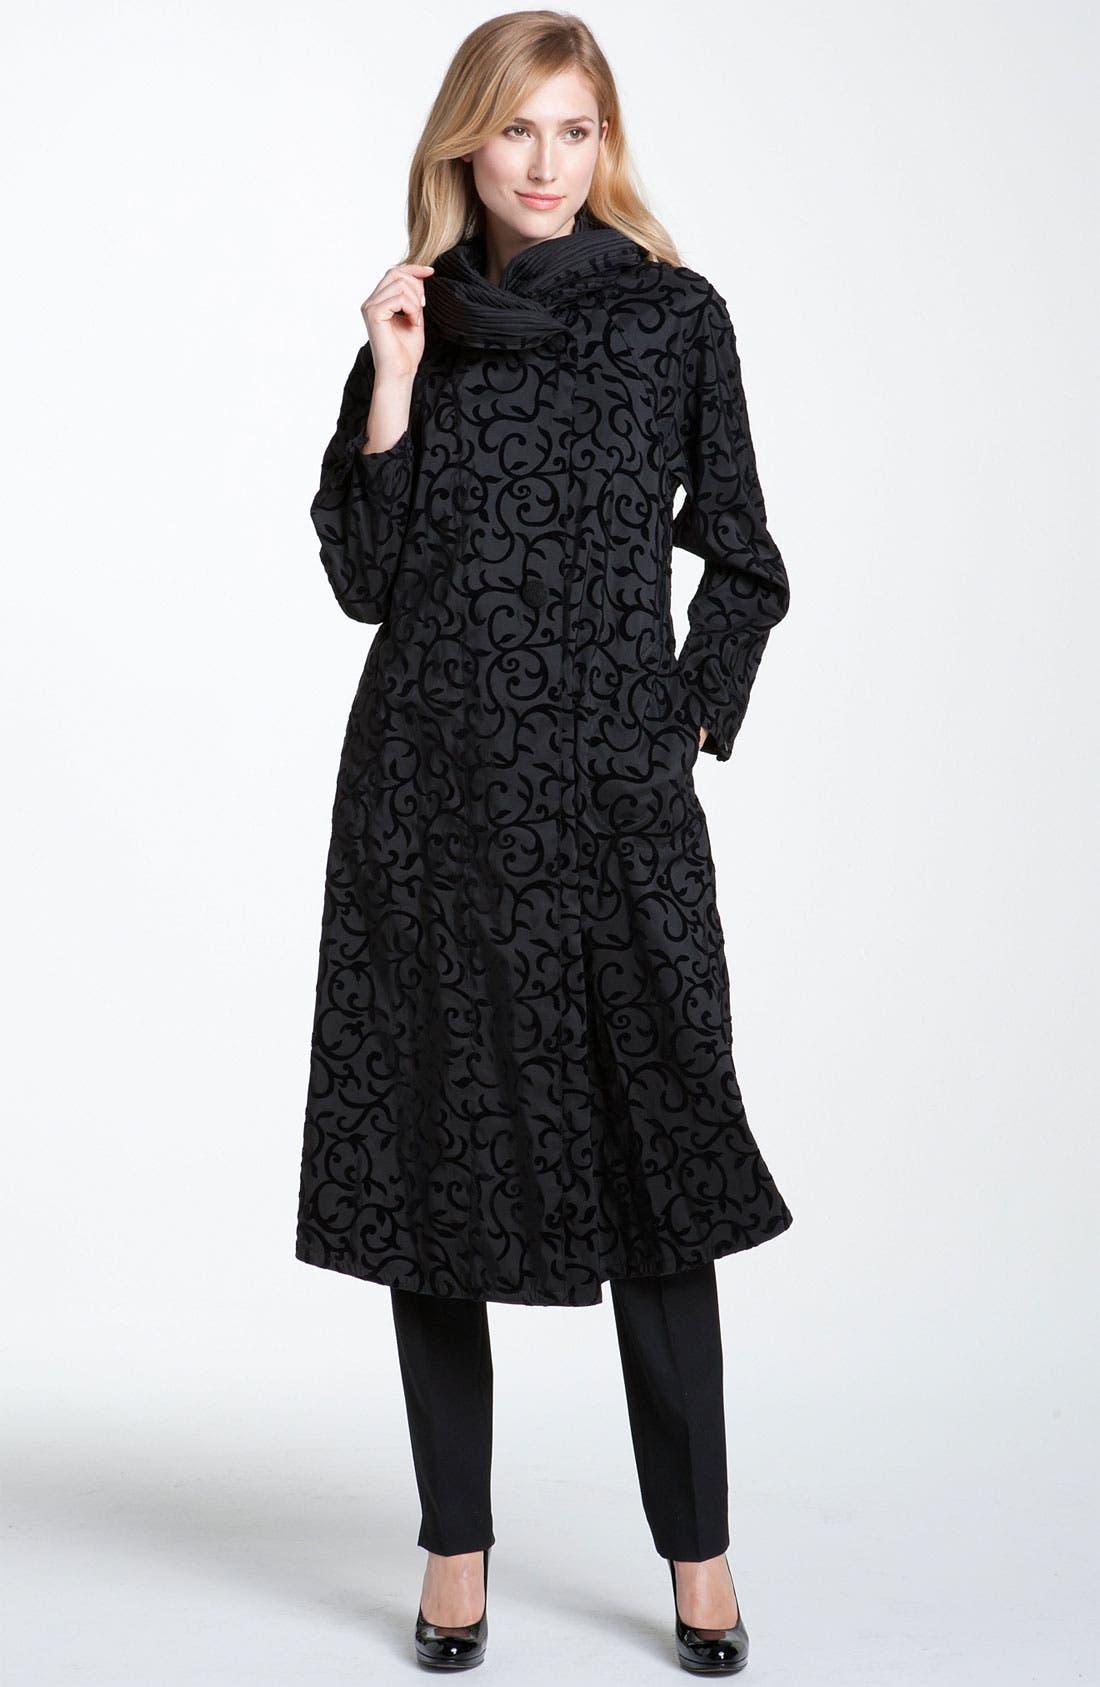 Alternate Image 1 Selected - Mycra Pac Designer Wear 'Donatella' Travel Coat